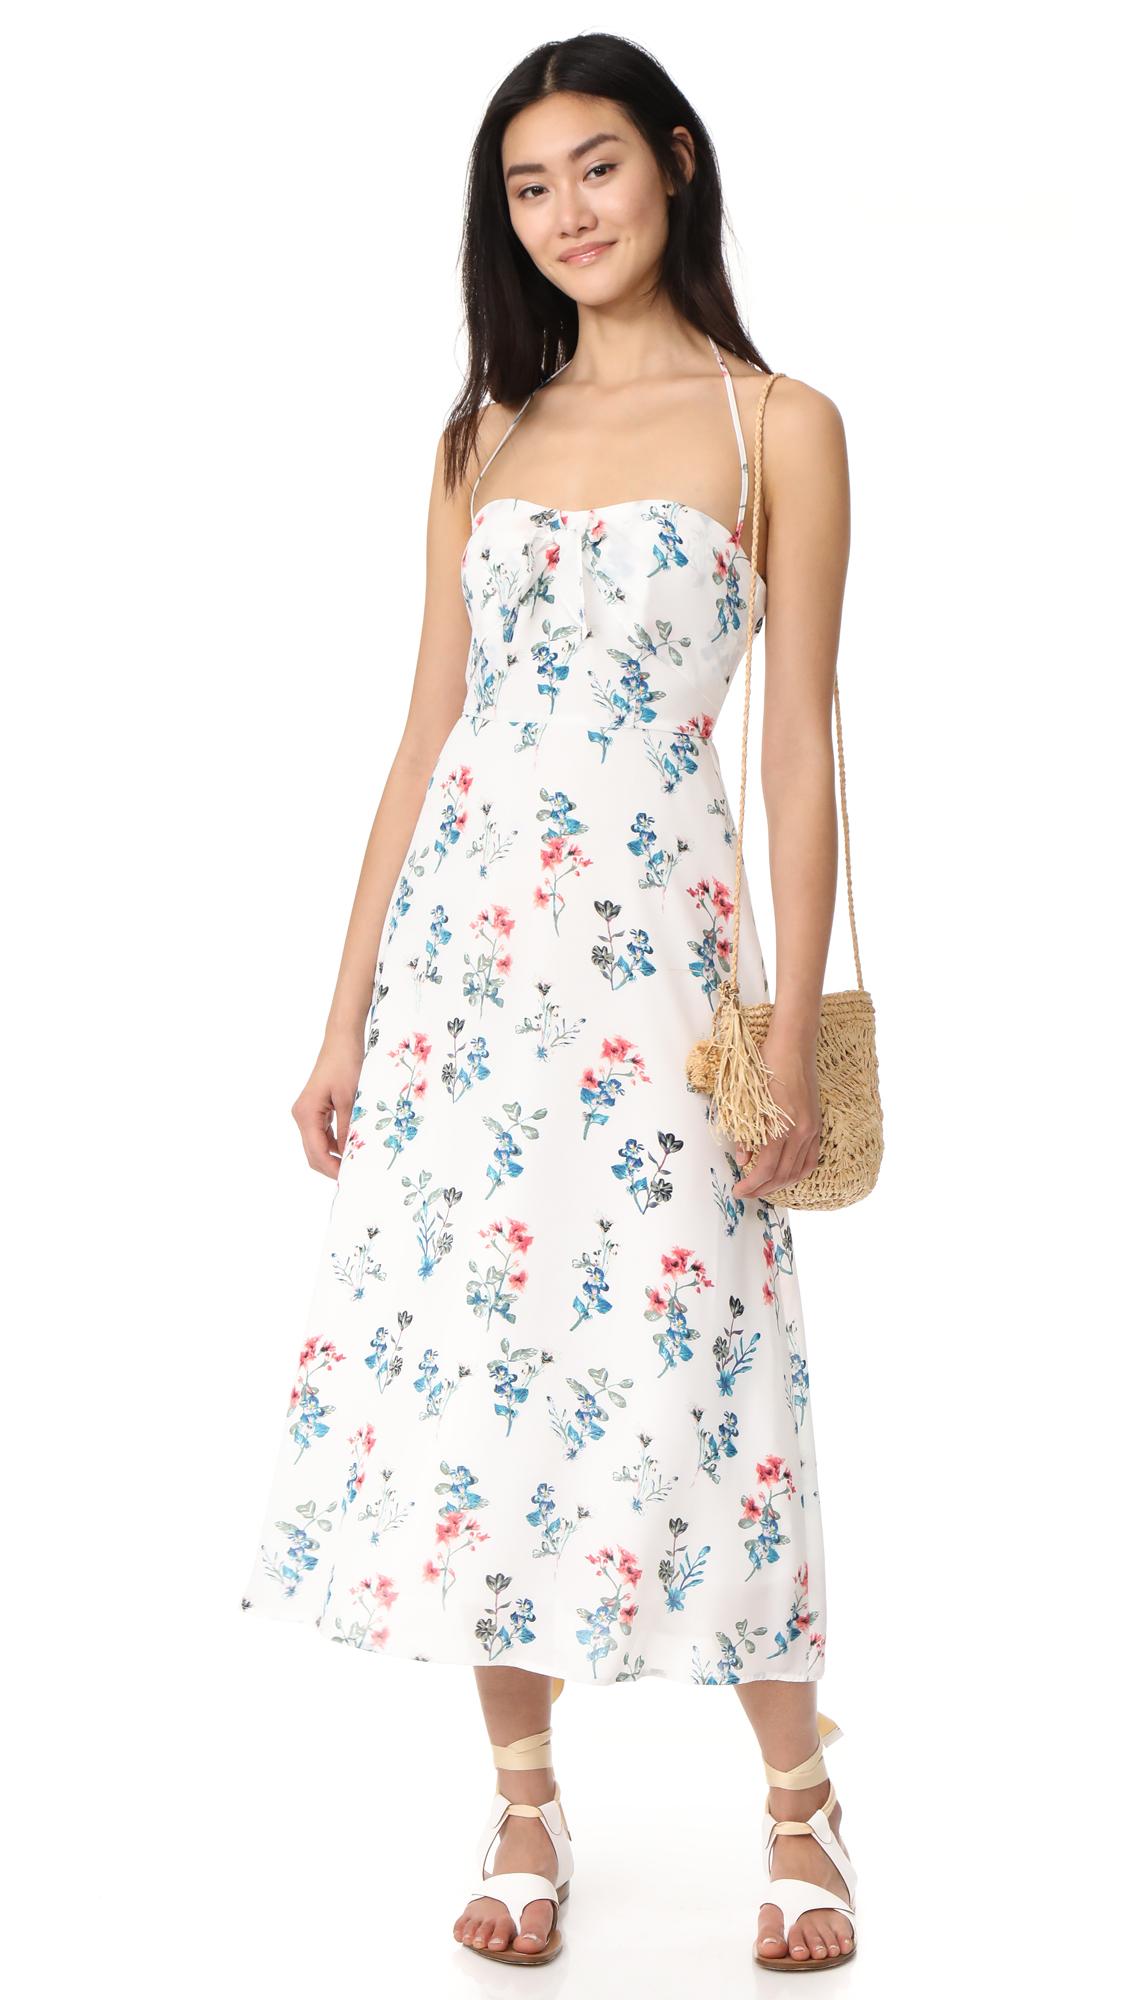 20 Summer Dresses to Buy at Shopbop's Huge Summer Sale - Racked